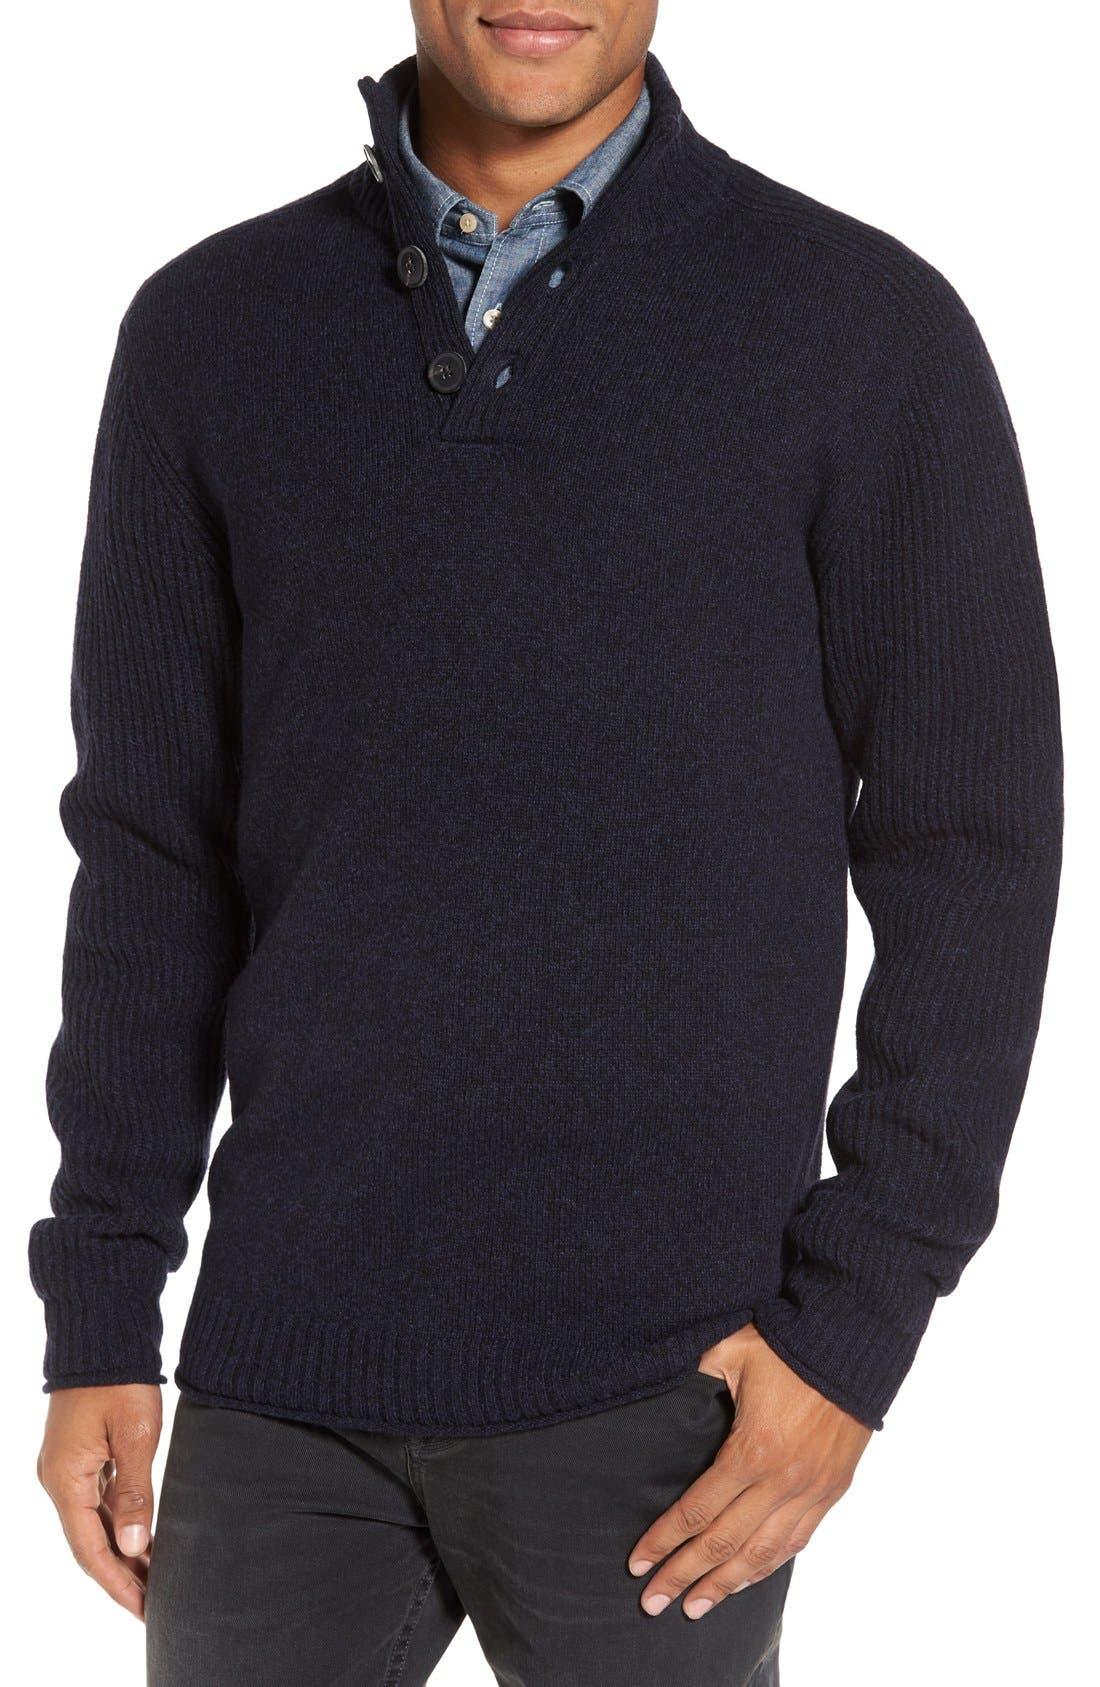 Alternate Image 1 Selected - Rodd & Gunn Birkenhead Mock Neck Sweater